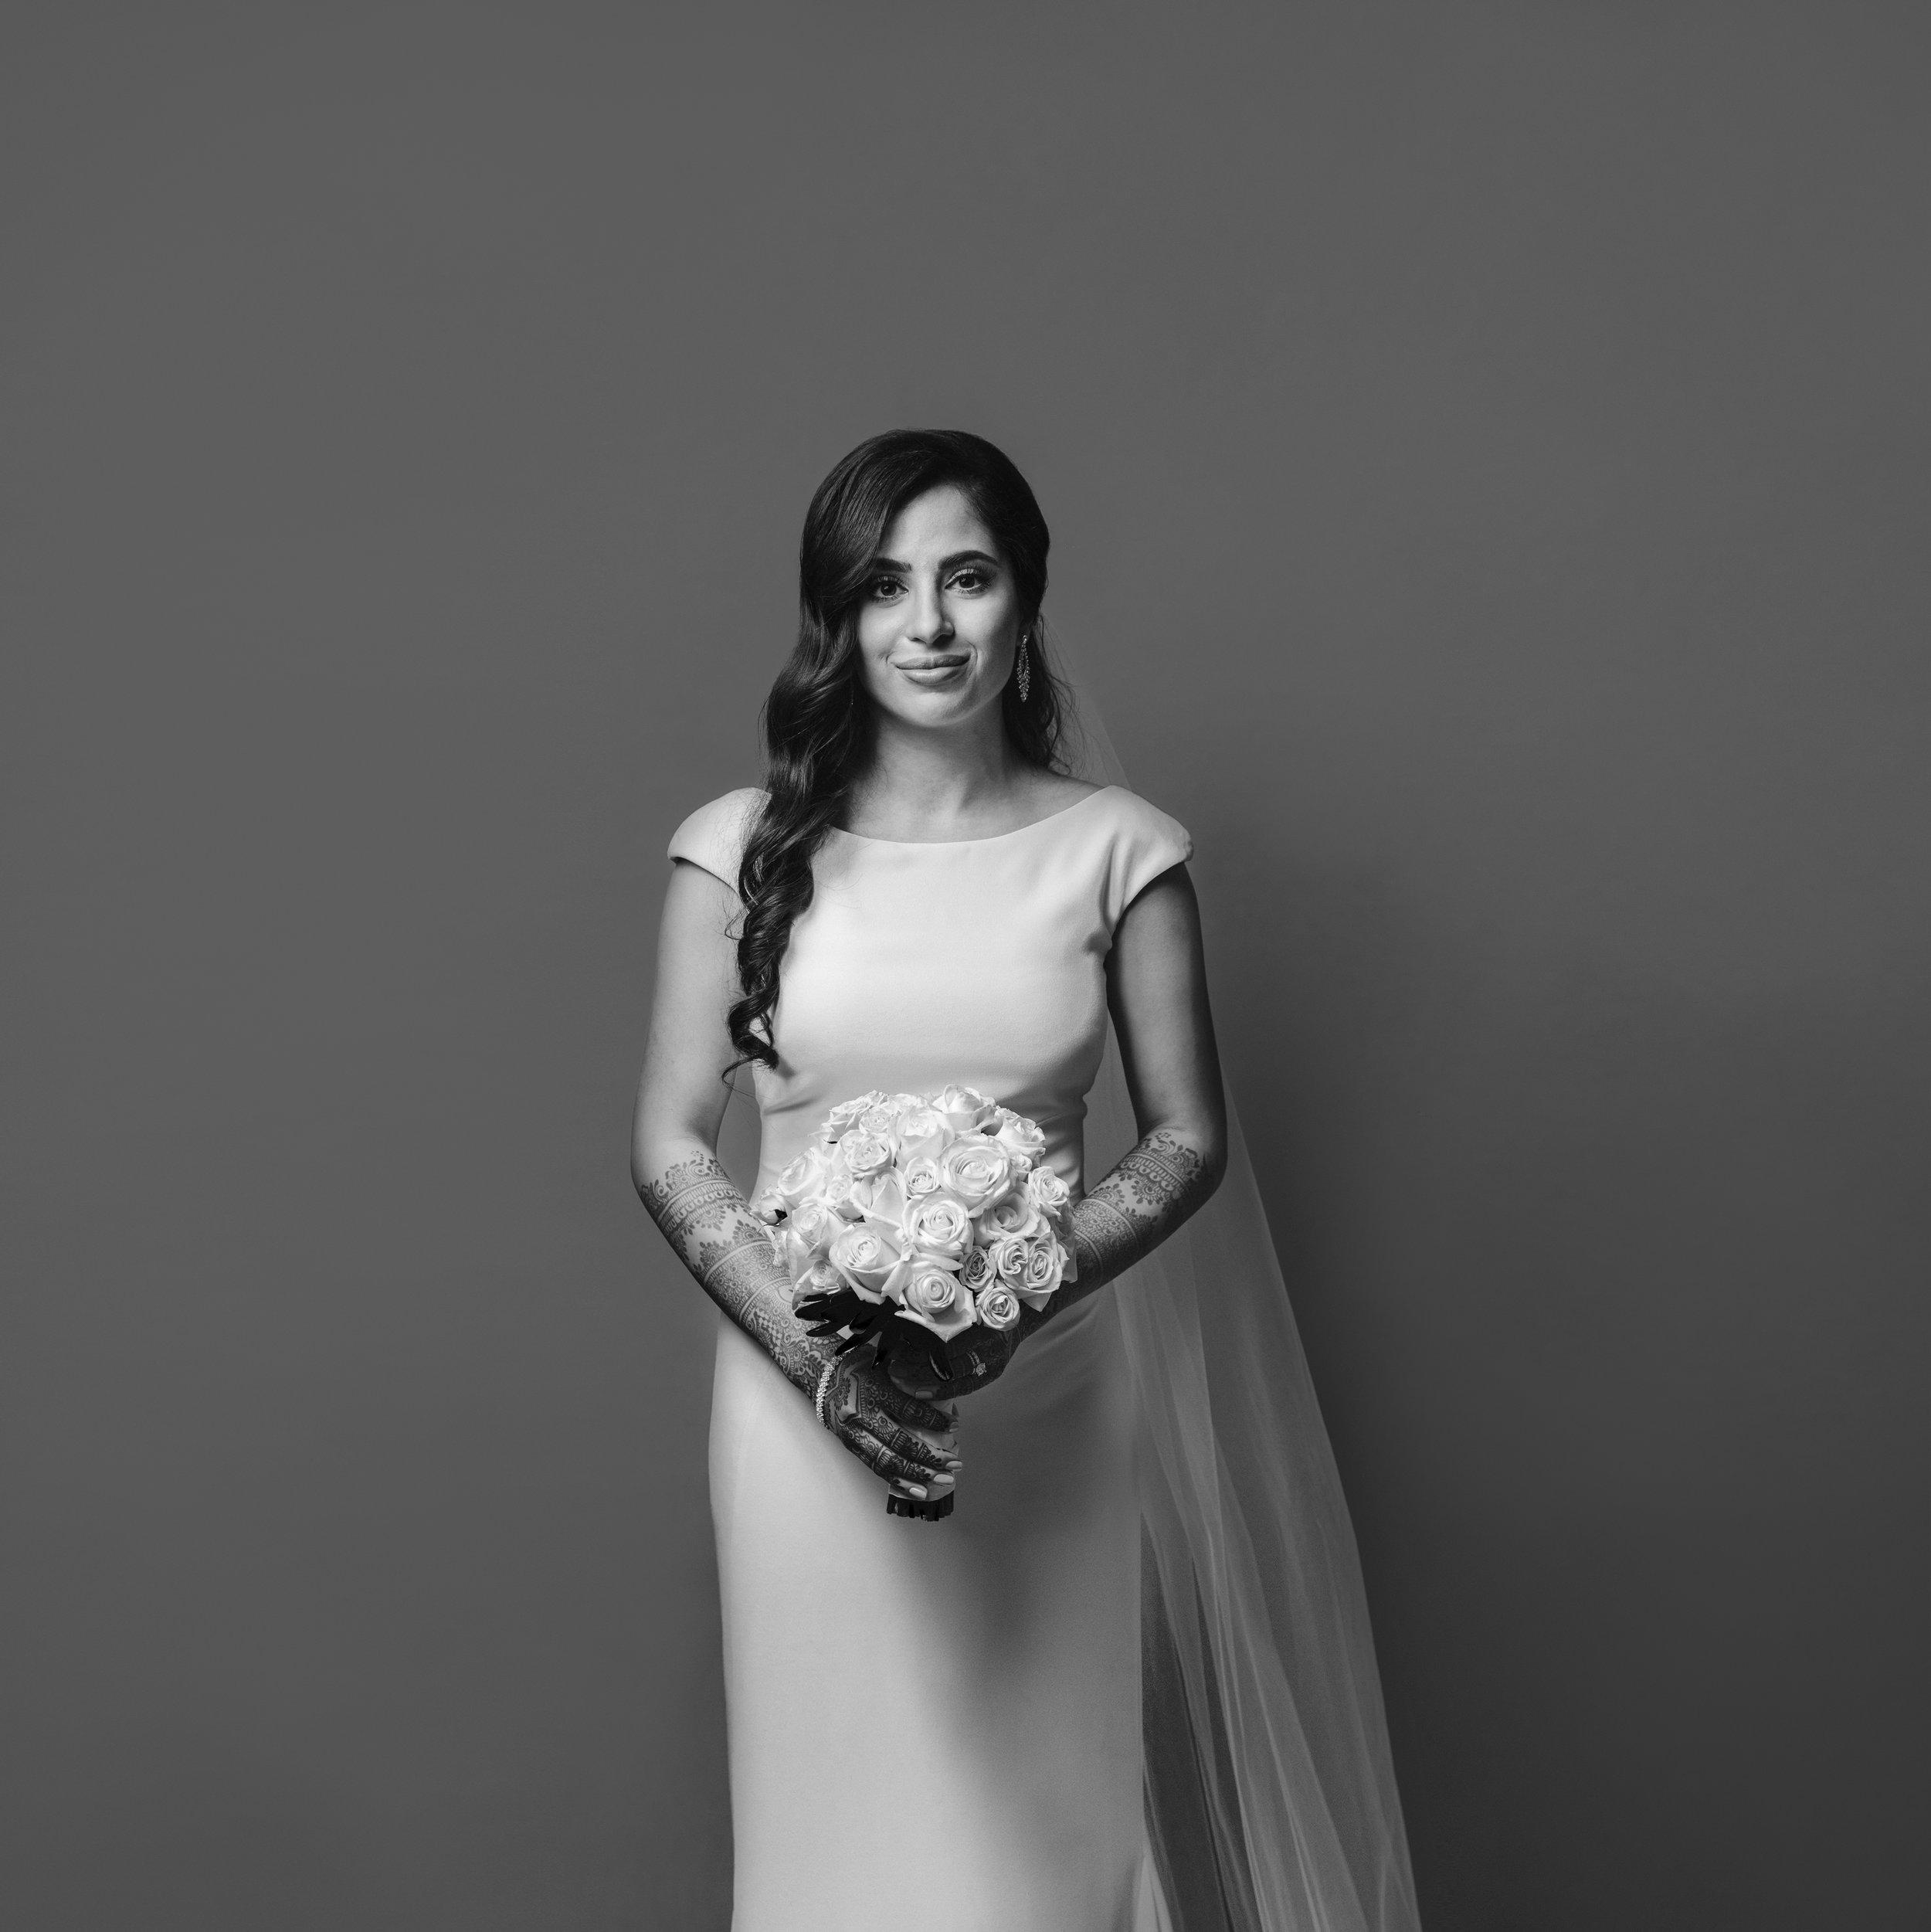 herastudios_wedding_aneesha_kris_hera_selects-59.jpg